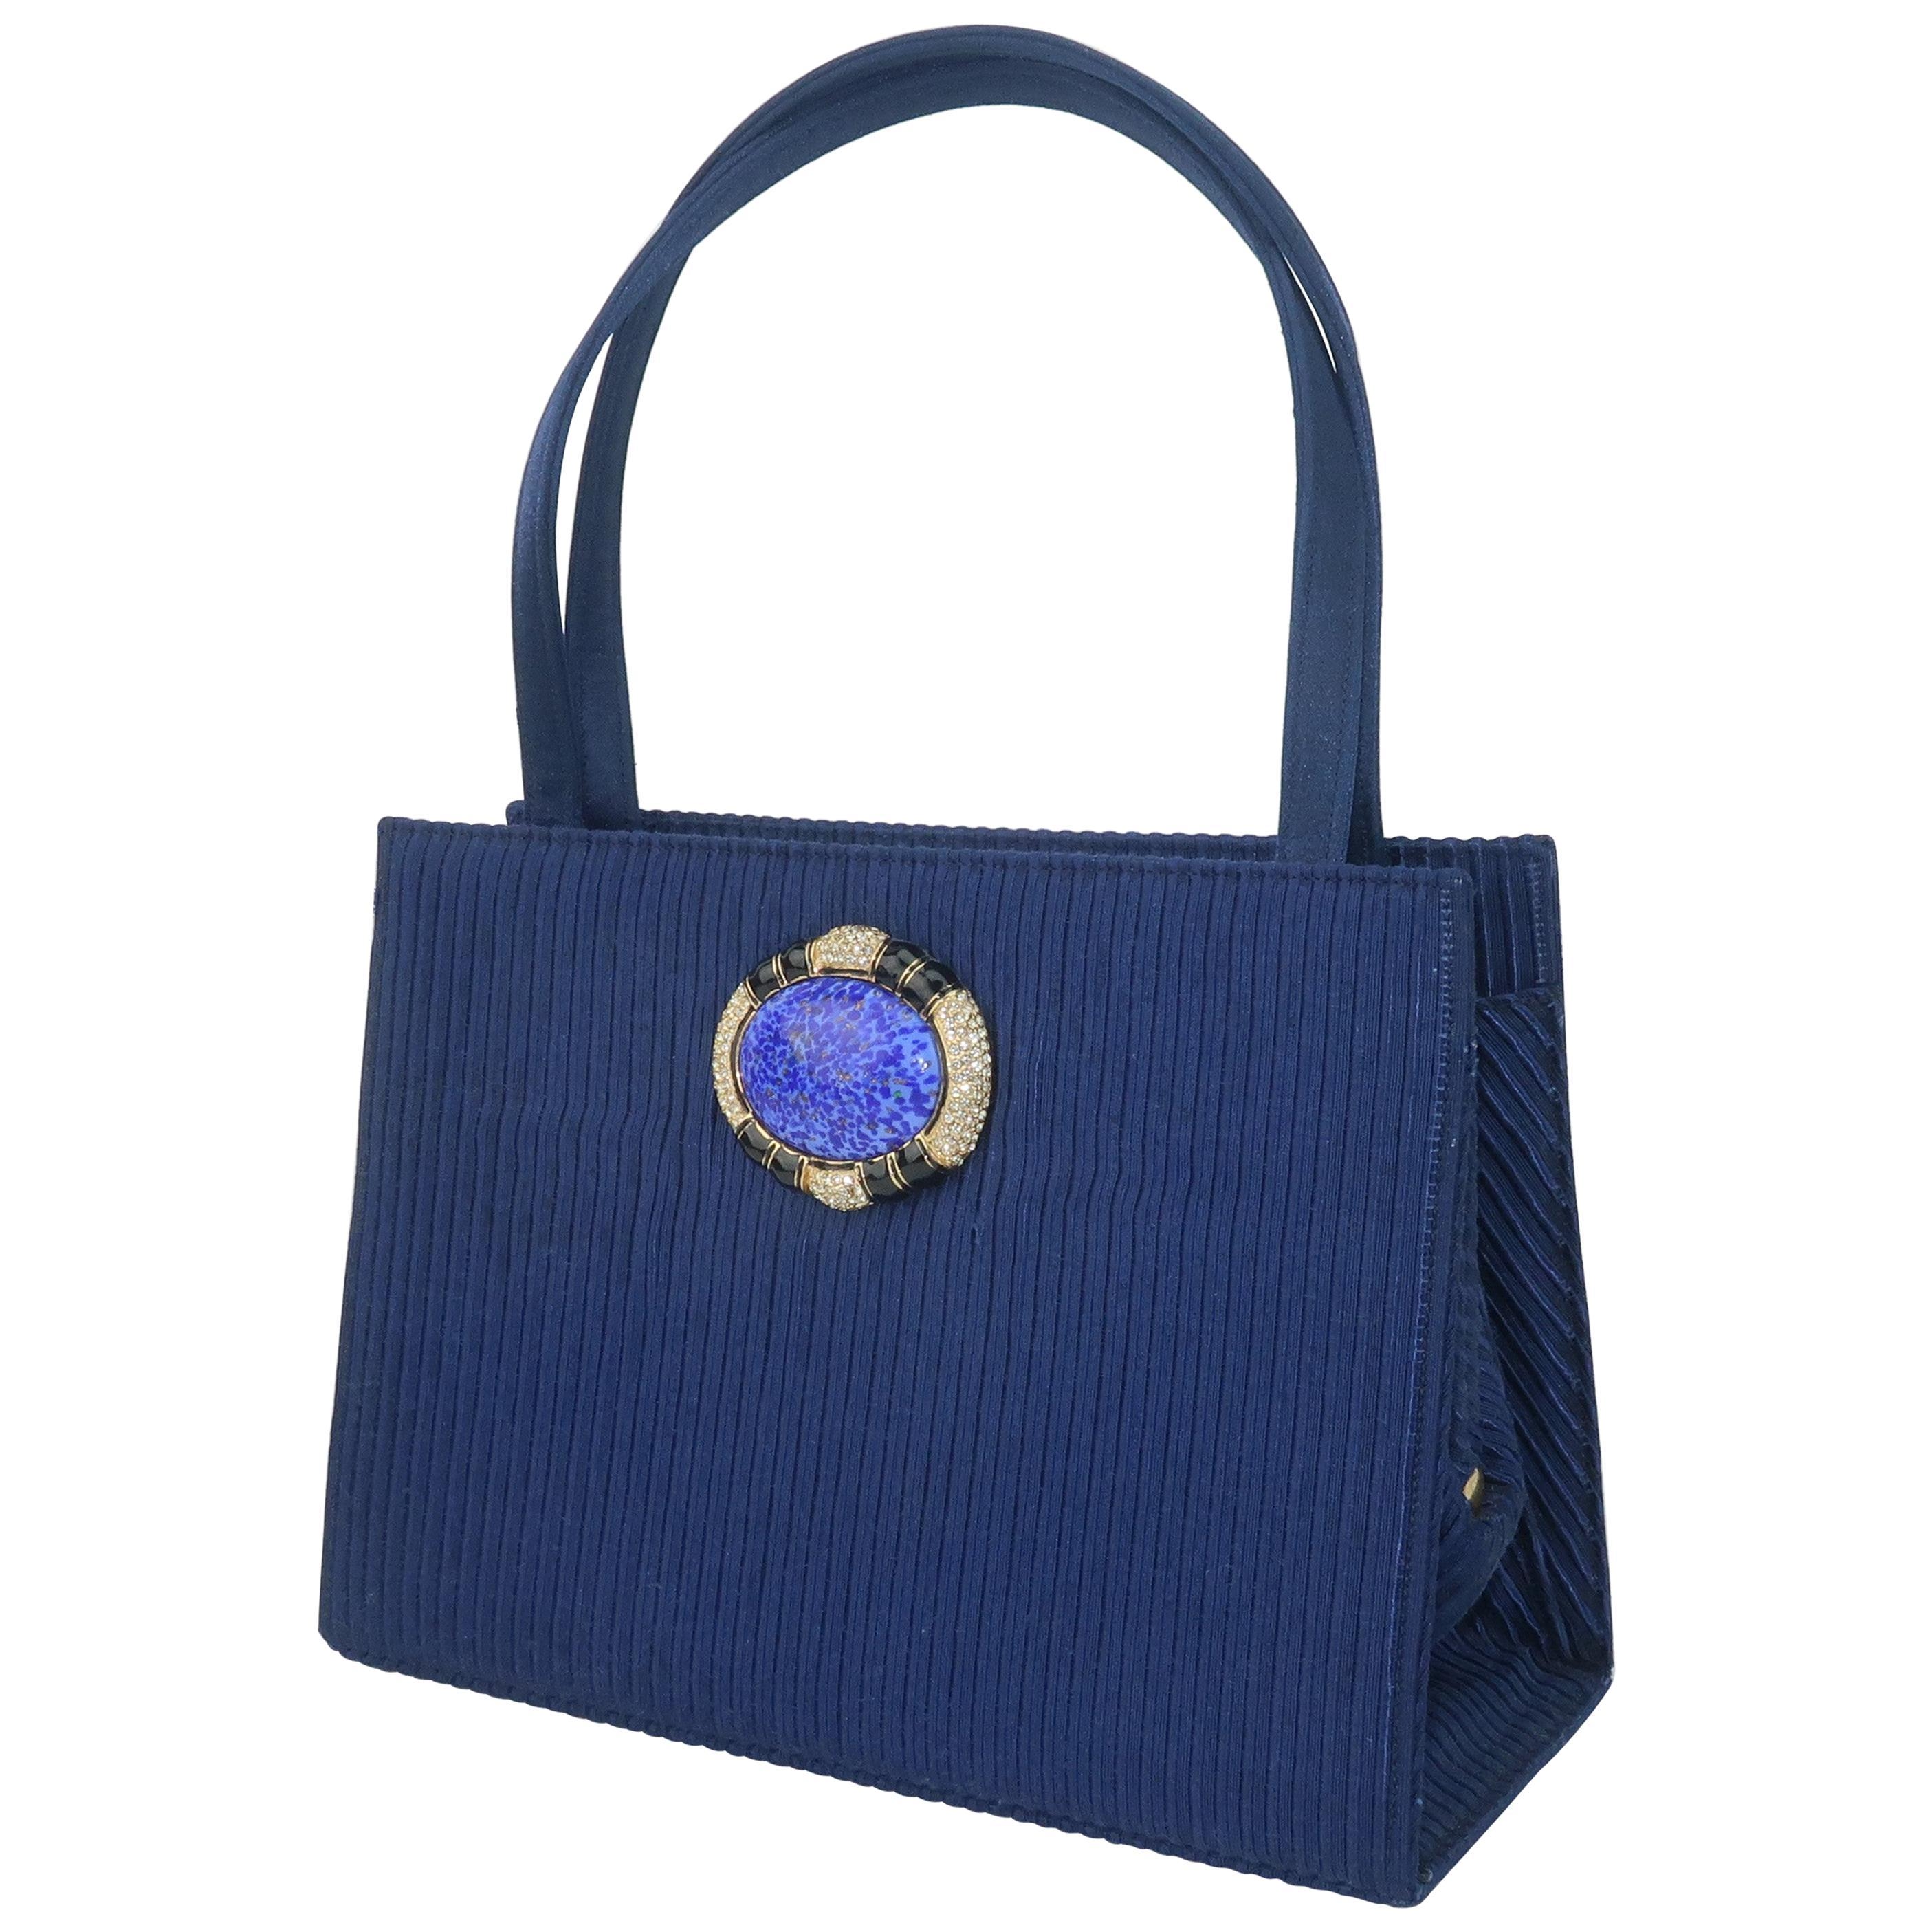 Martin Van Schaak Royal Blue Fabric Handbag, 1960's